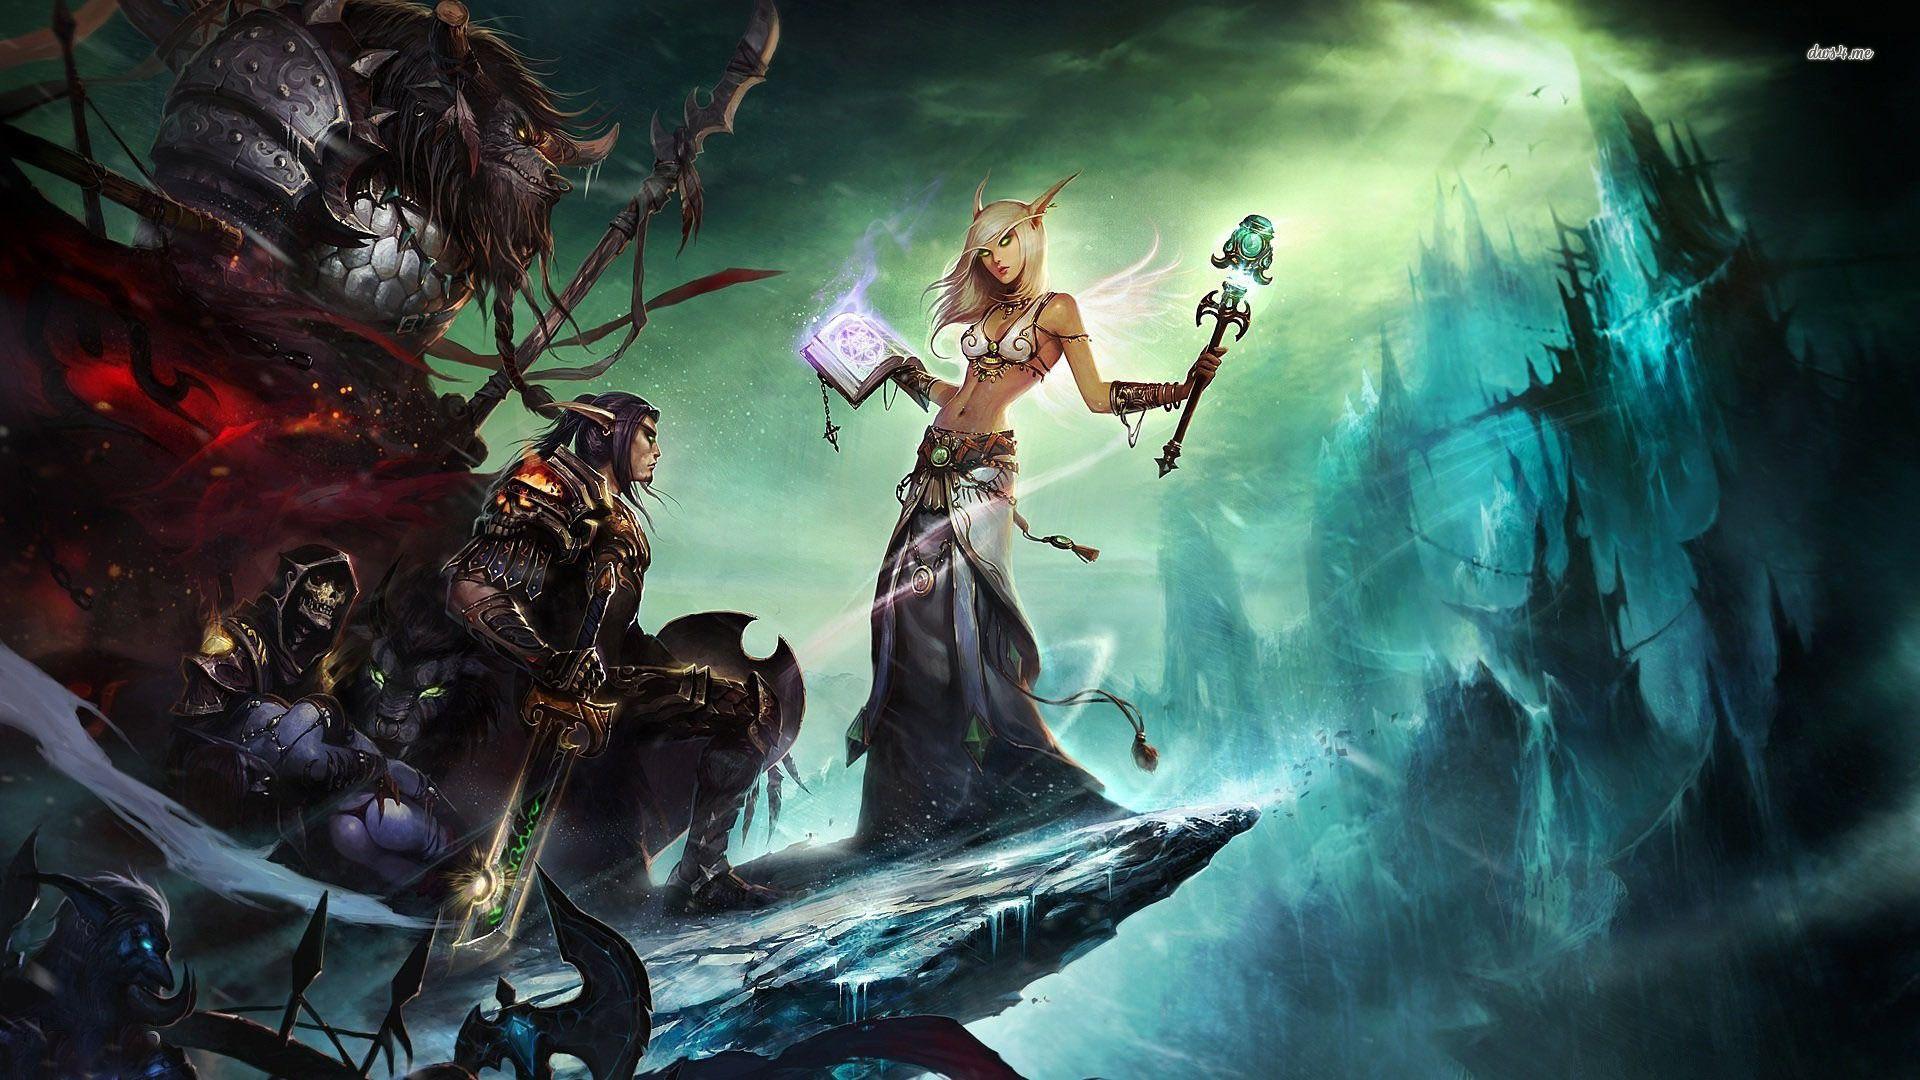 World Of Warcraft Hd Wallpaper World Of Warcraft Wallpaper World Of Warcraft World Of Warcraft Characters